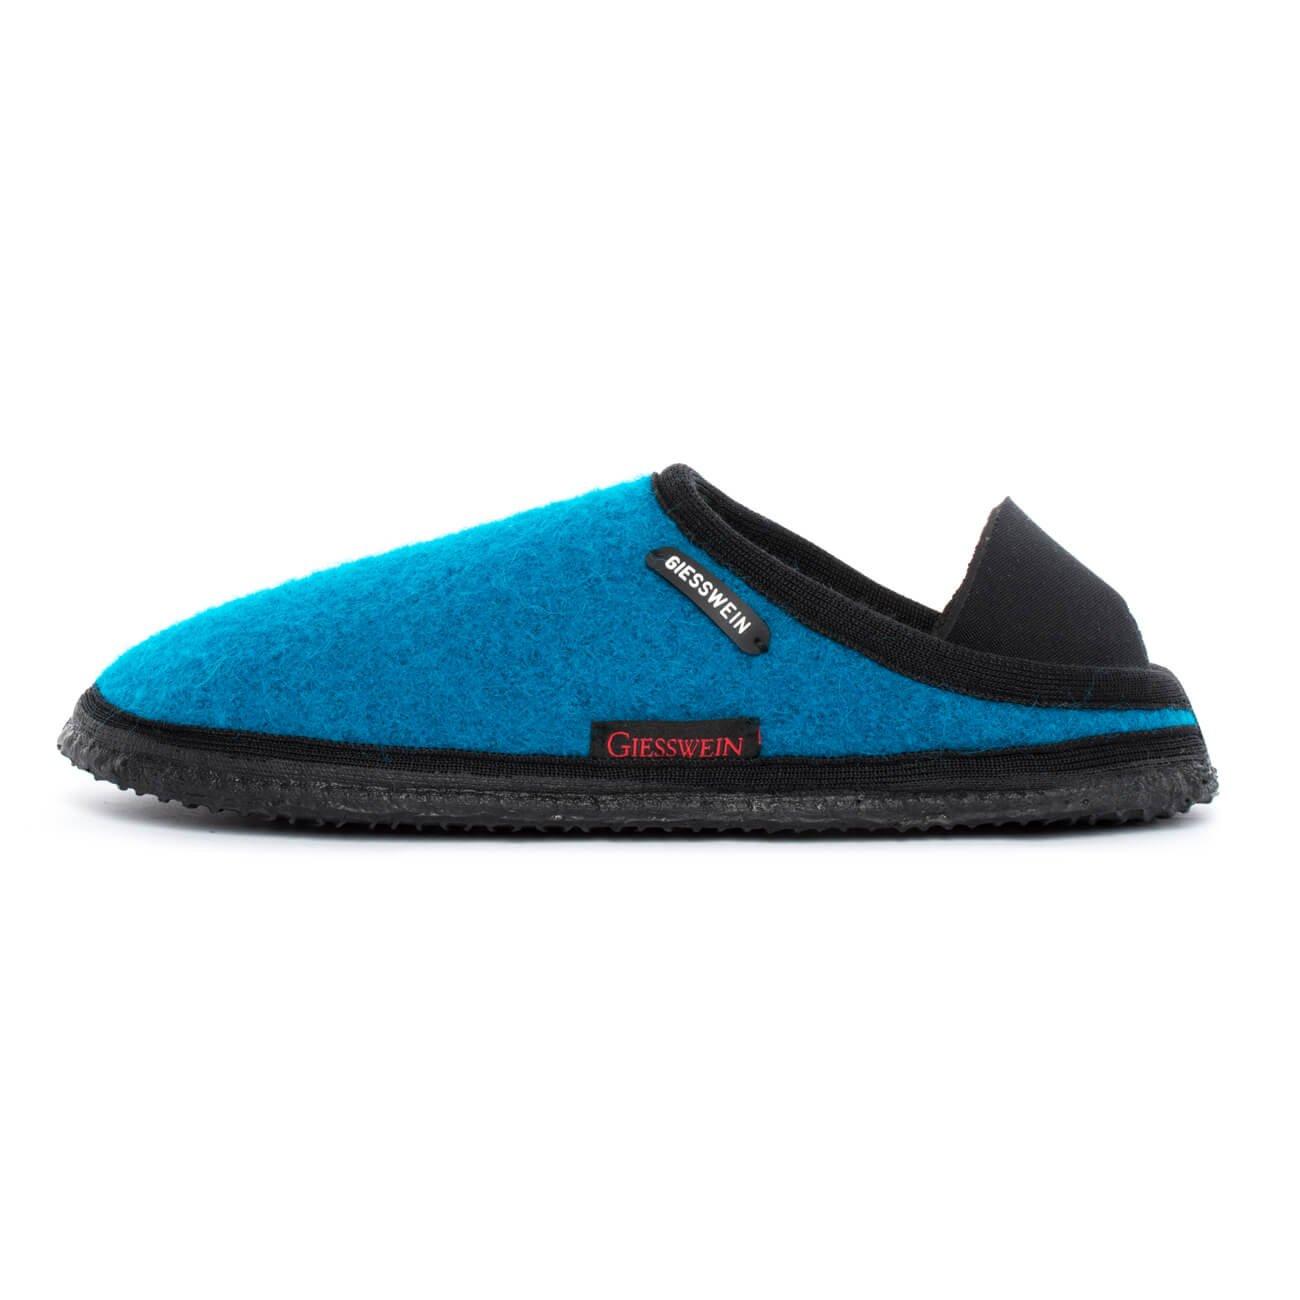 Giesswein 68 10 49131, Pantofole Unisex Adulto Blu (Taubenblu 573)   Di Prima Qualità    Sig/Sig Ra Scarpa